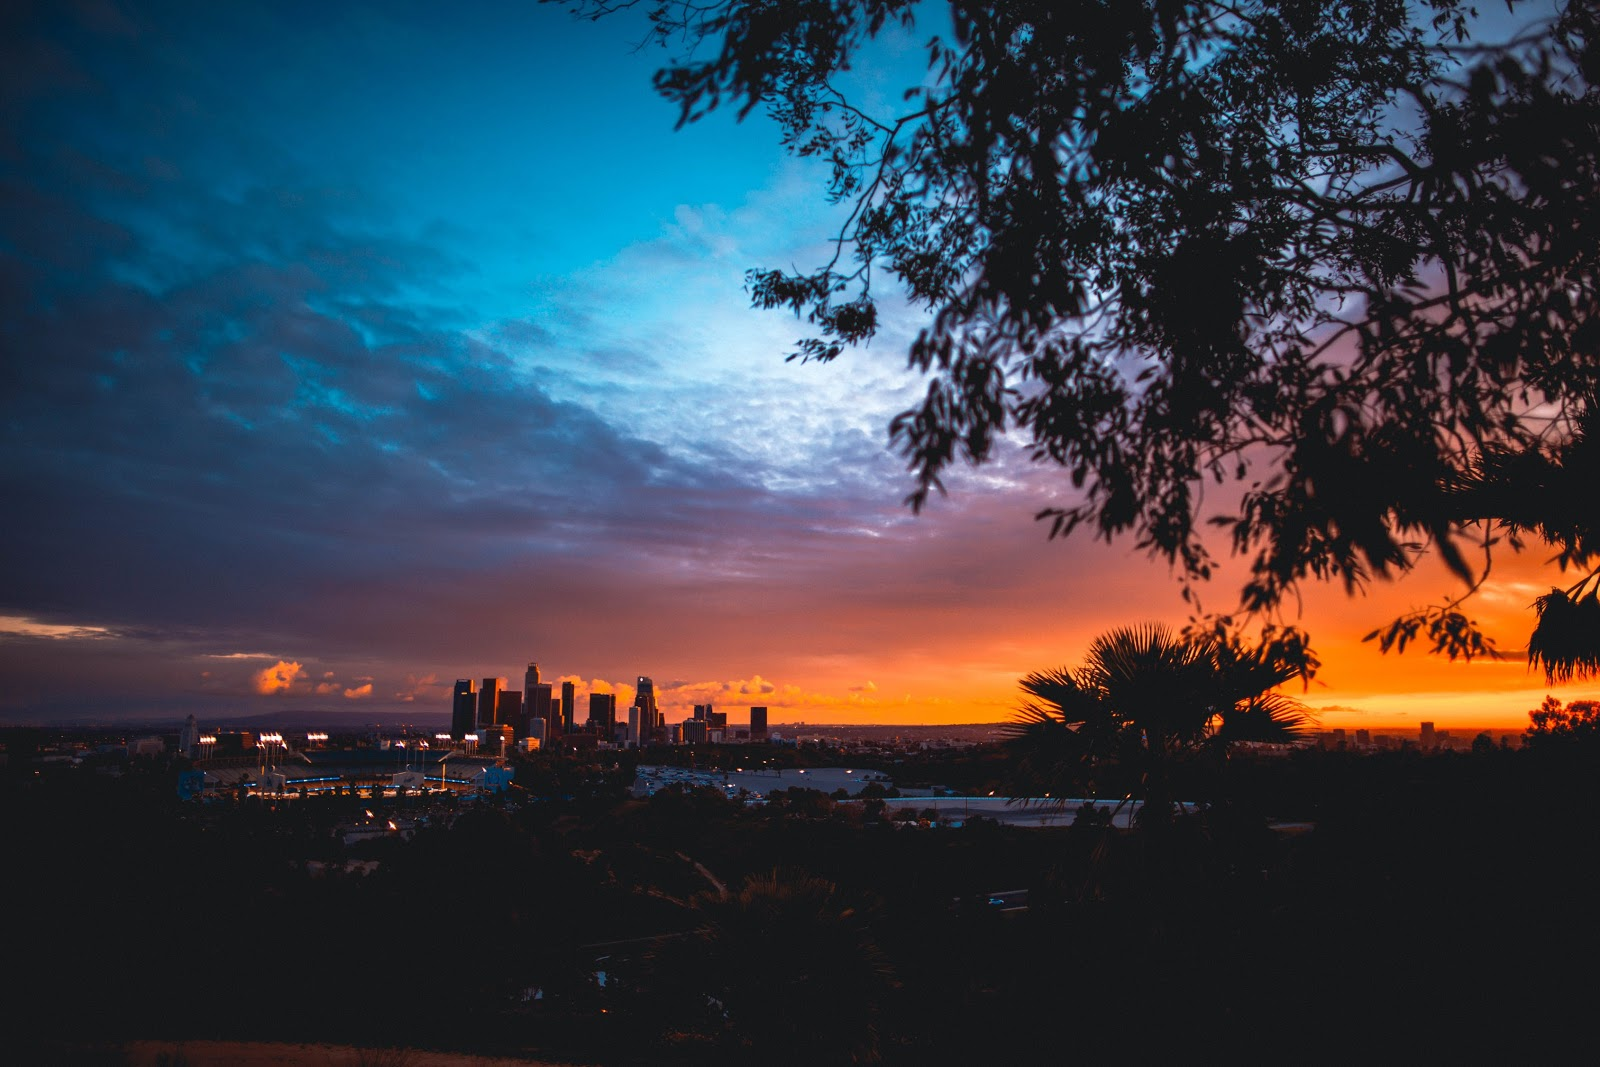 beautiful evening sky in Los Angeles